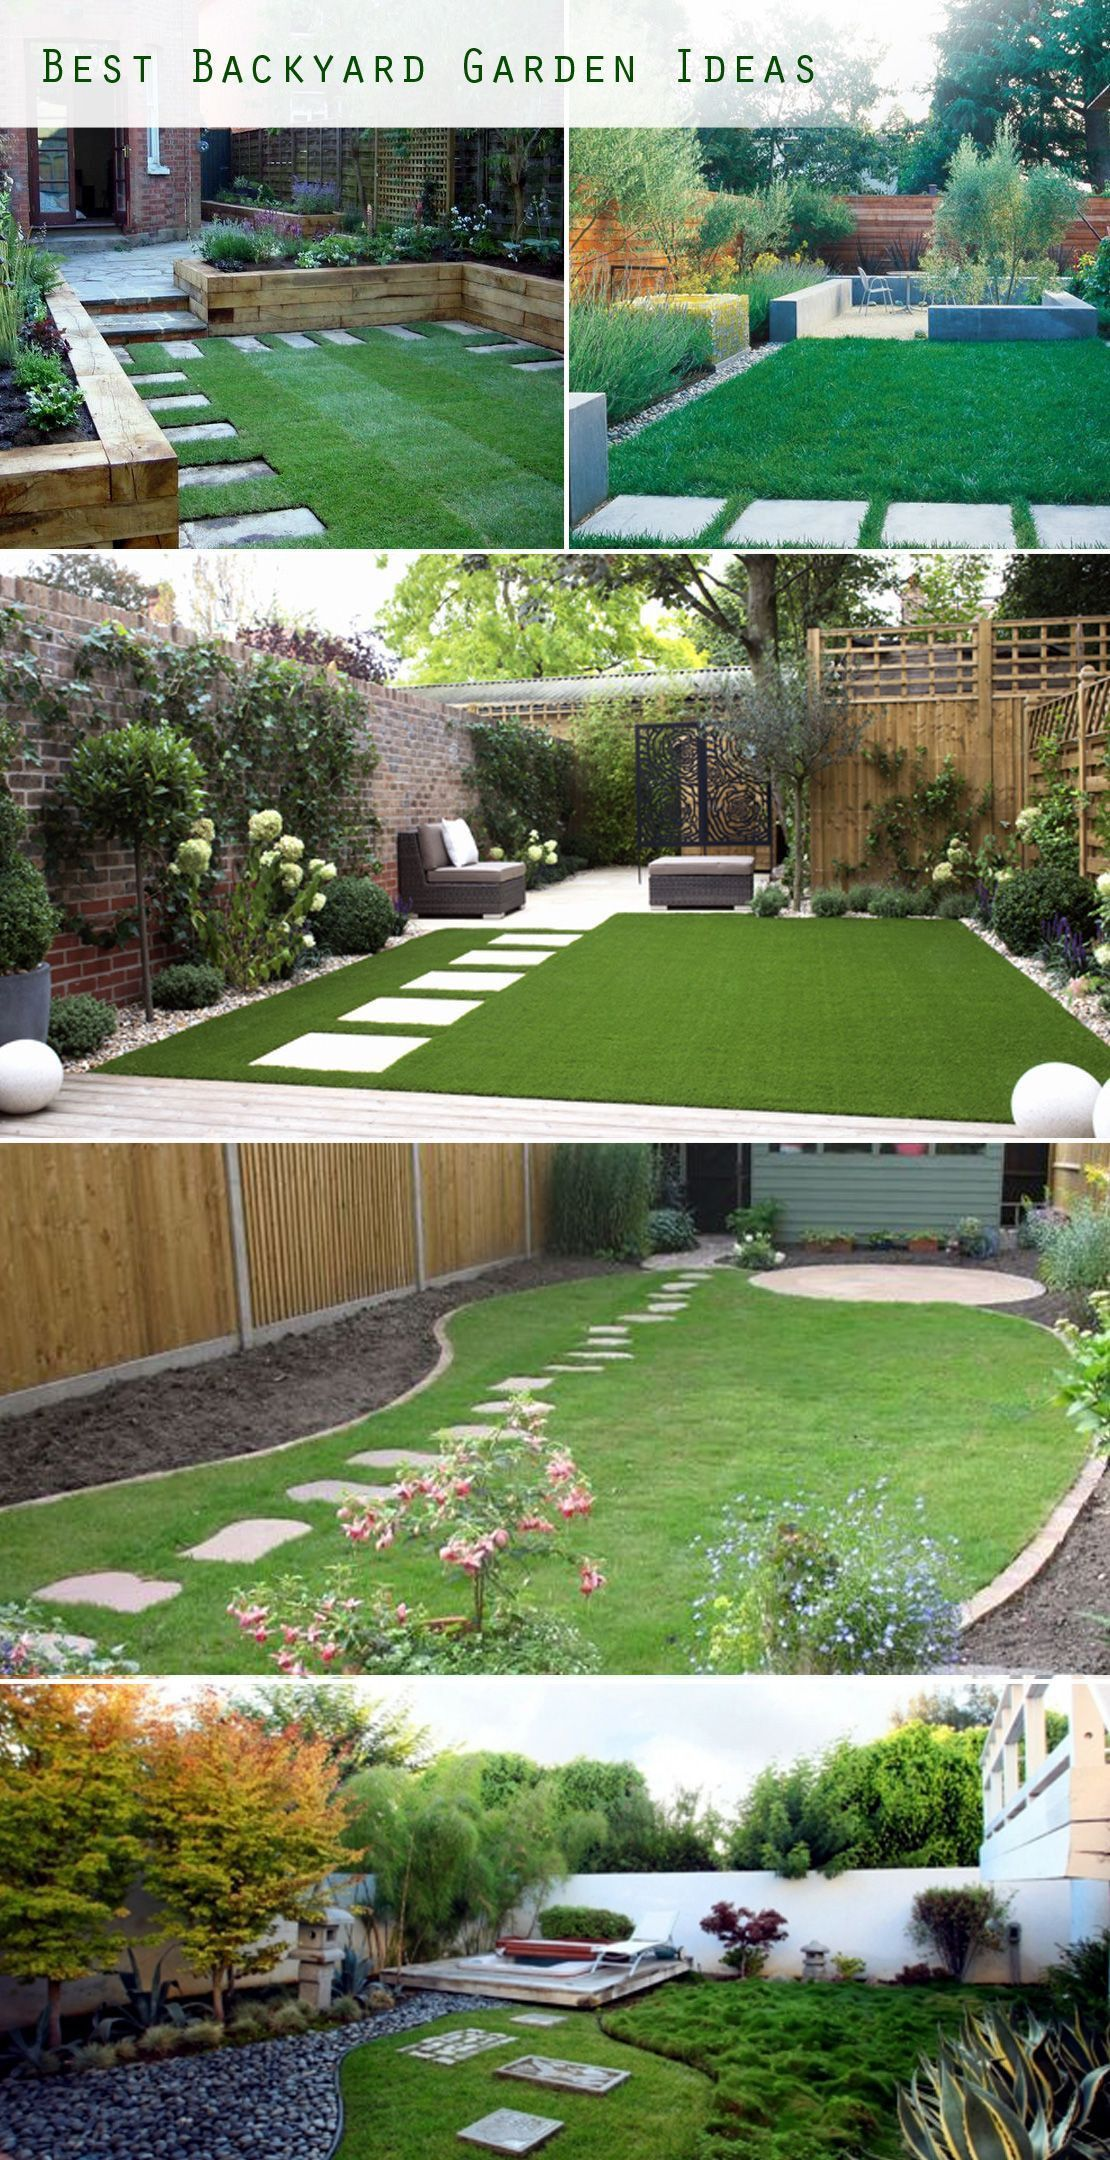 New Garden Landscaping Design Inspiration Backyards 10 Gardening Ideas Pinte In 2020 Backyard Garden Landscape Garden Landscape Design Garden Design Layout Landscaping